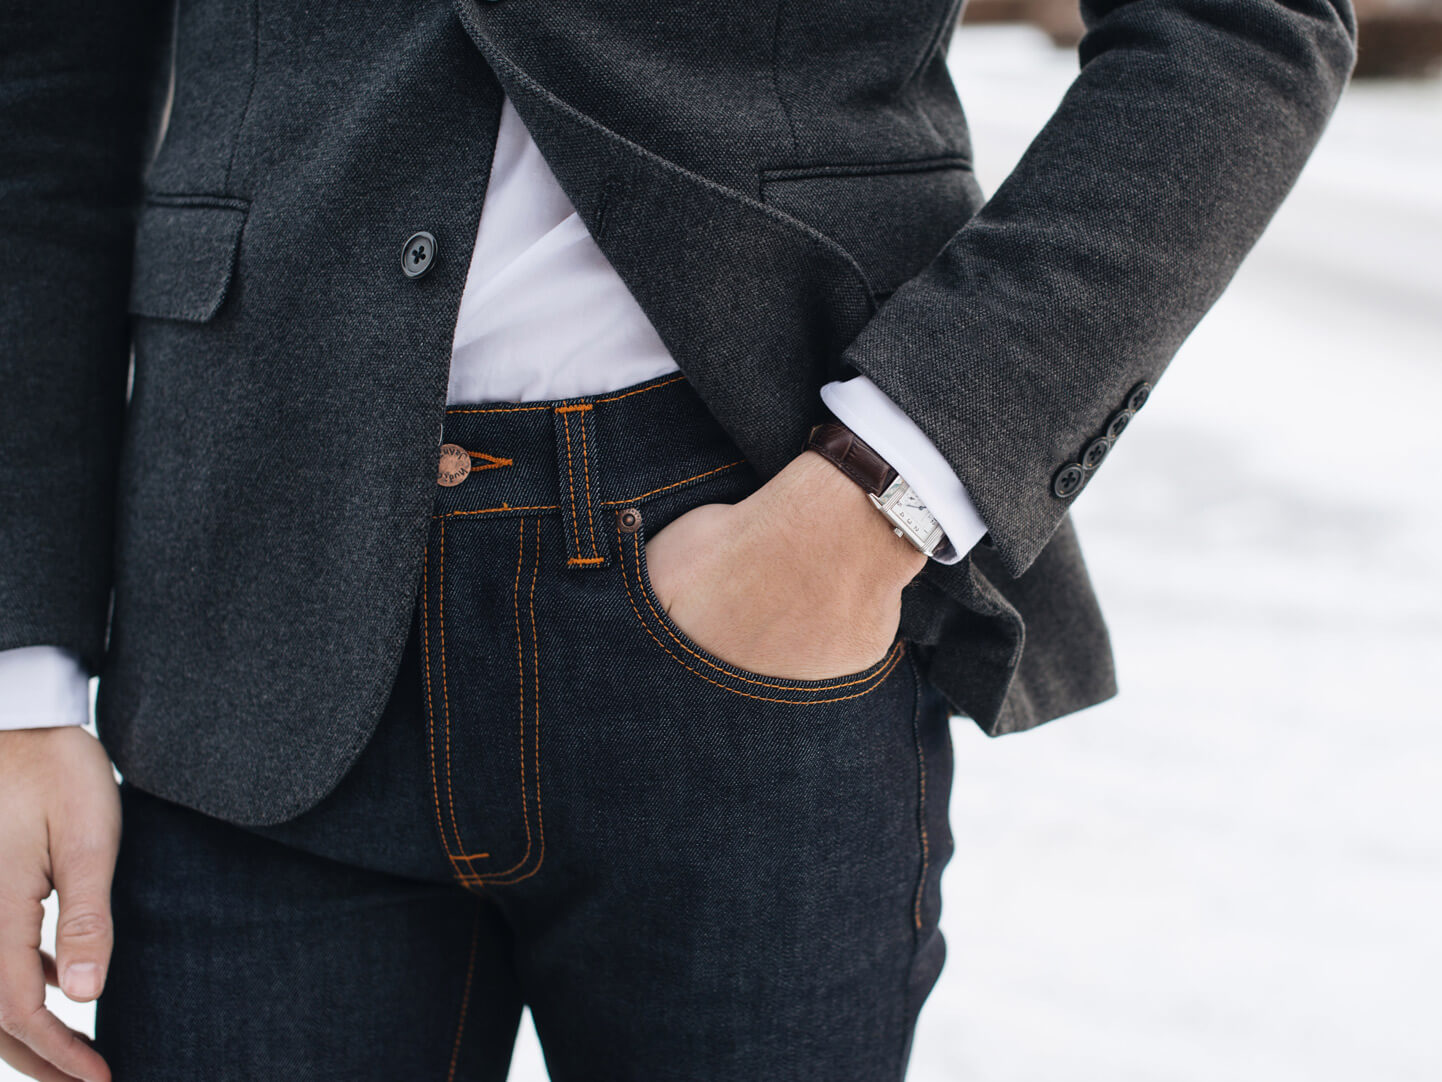 f8631dc9b4d Att bära jeans till kavaj   CareOfCarl.com